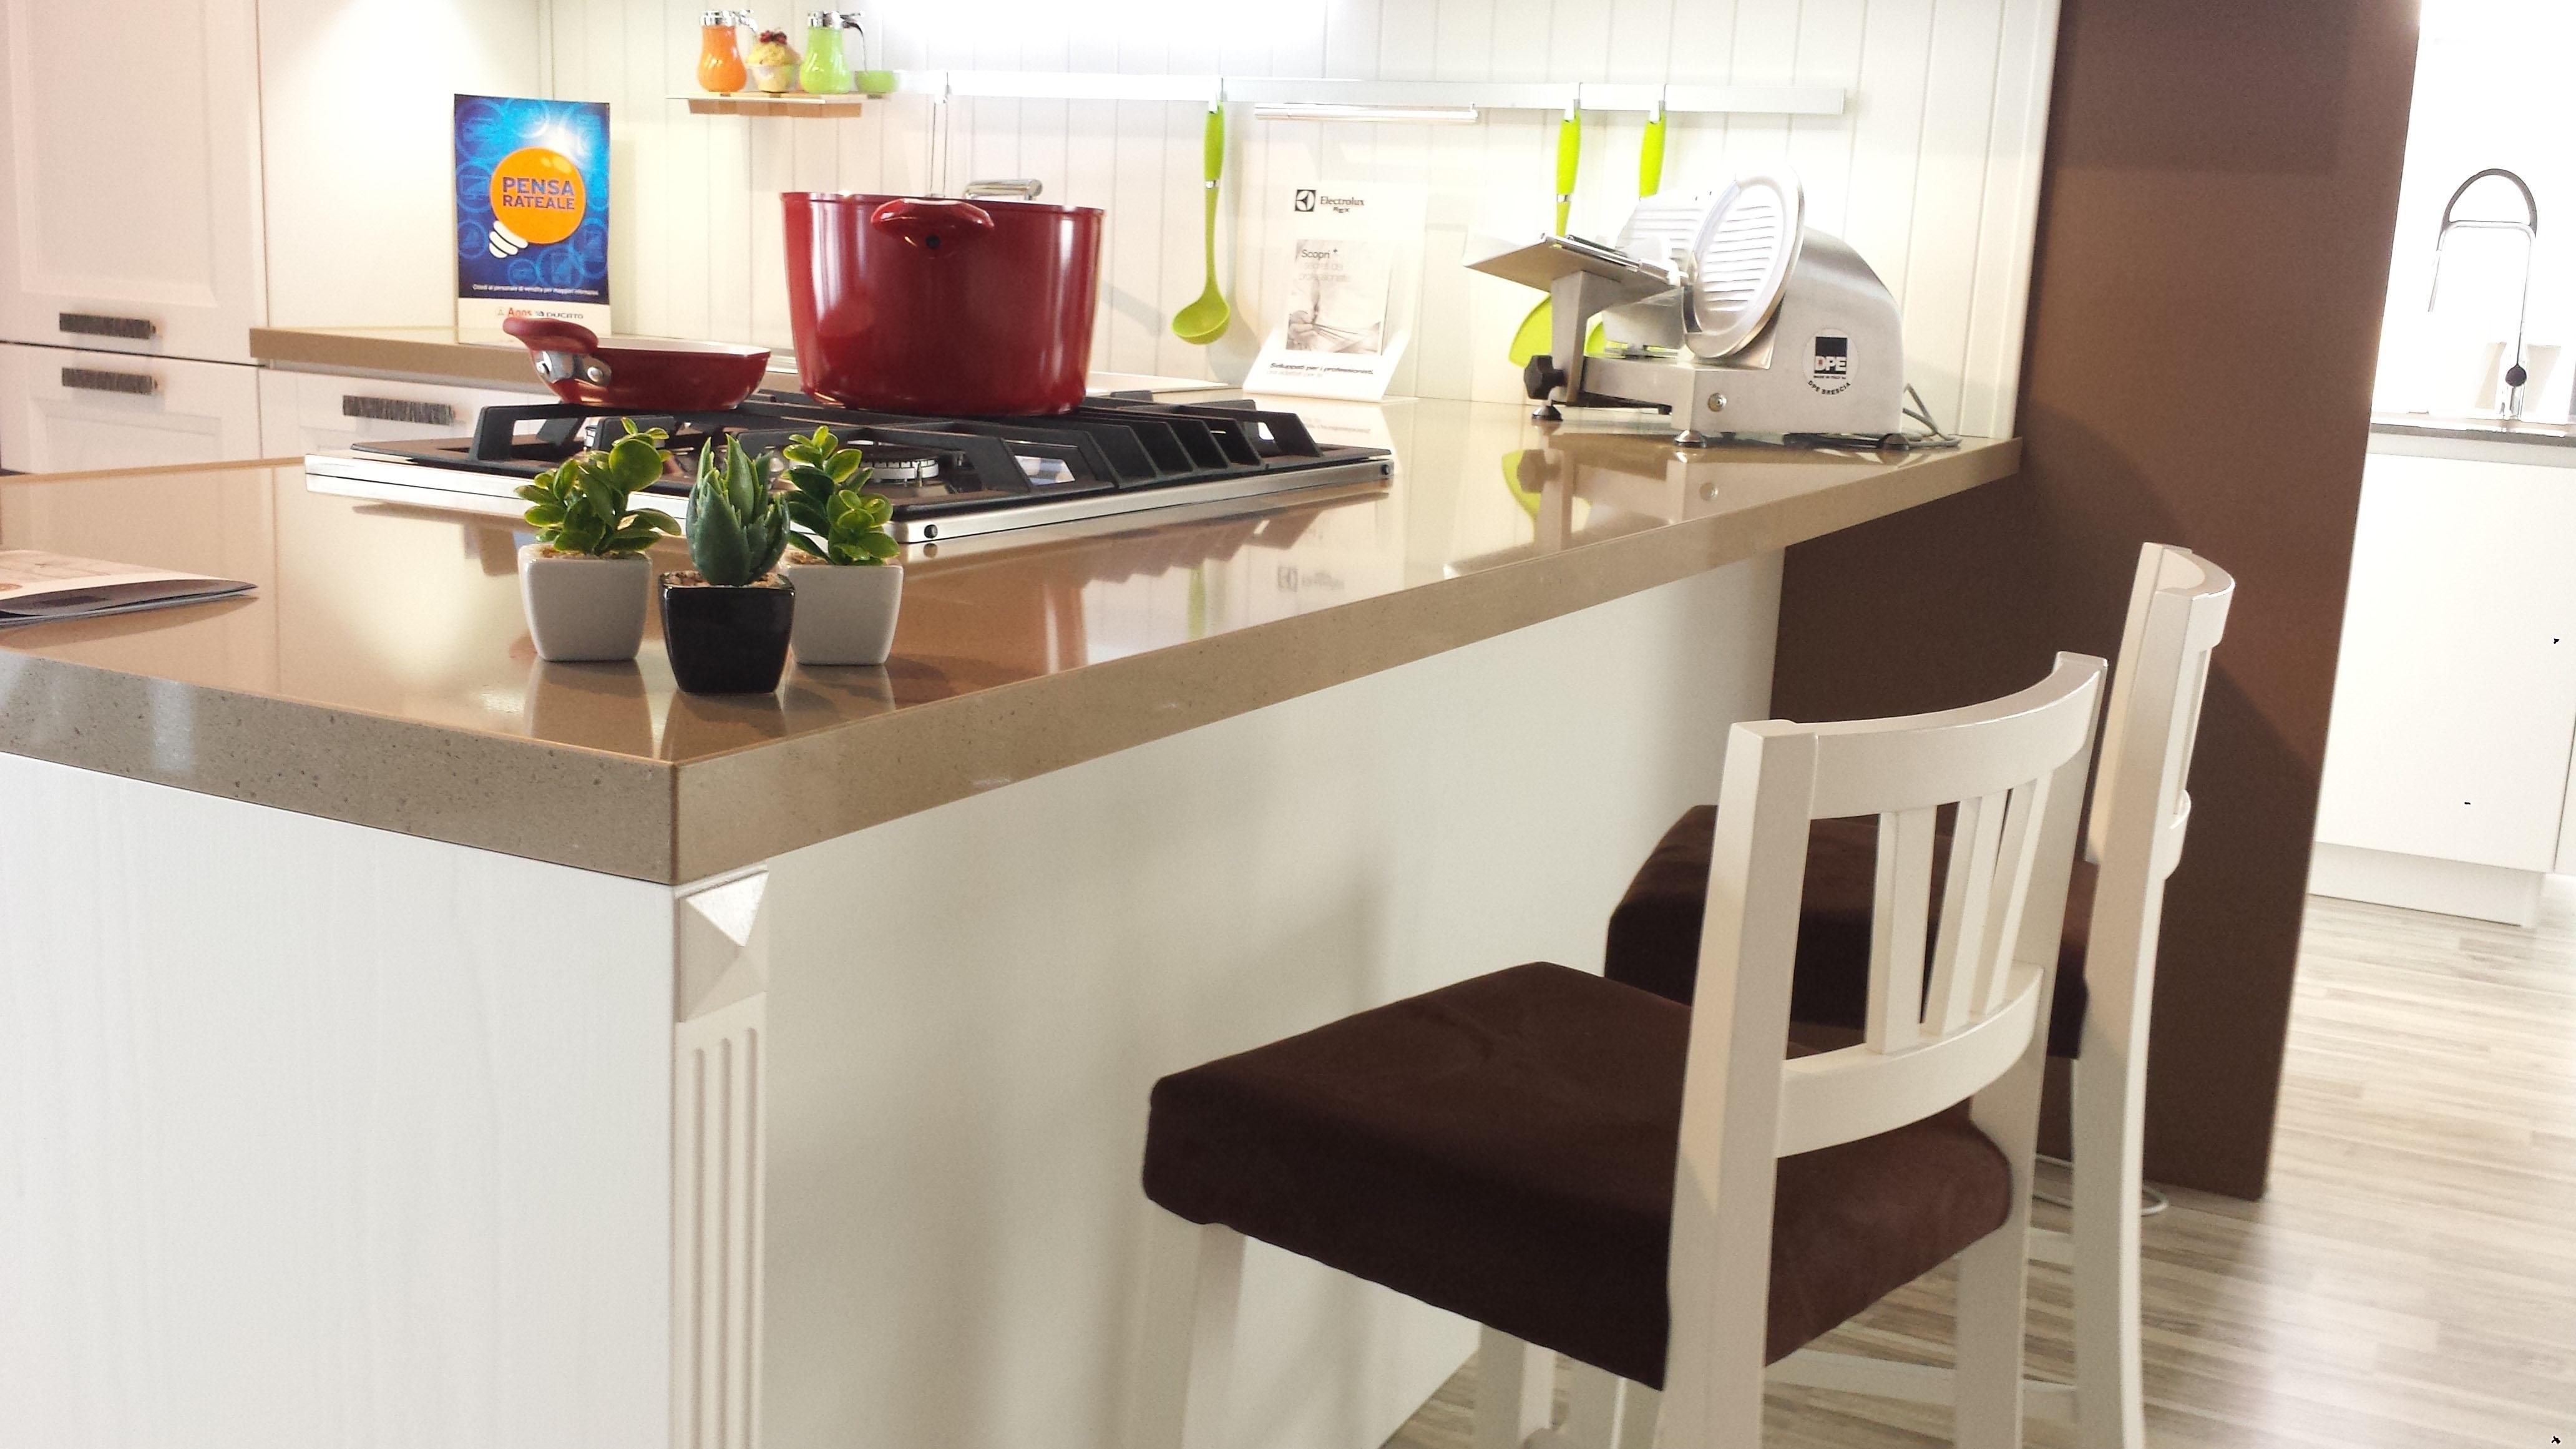 cucina stosa beverly in offerta completa di elettrodomestici ... - Cucine Stosa Beverly